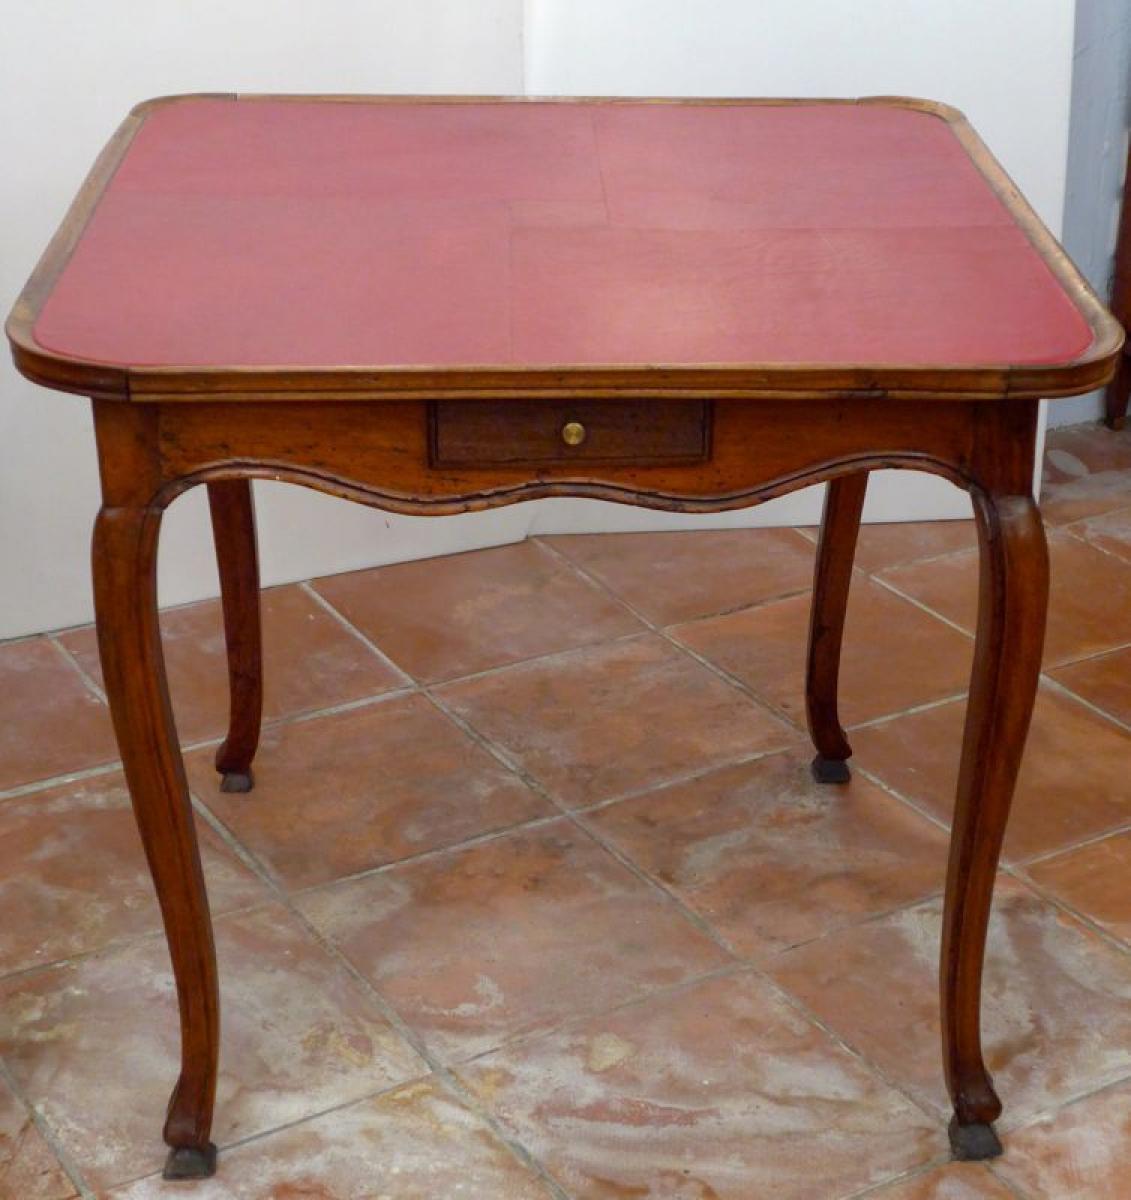 Card table antiques in france - Comment mettre la table en france ...